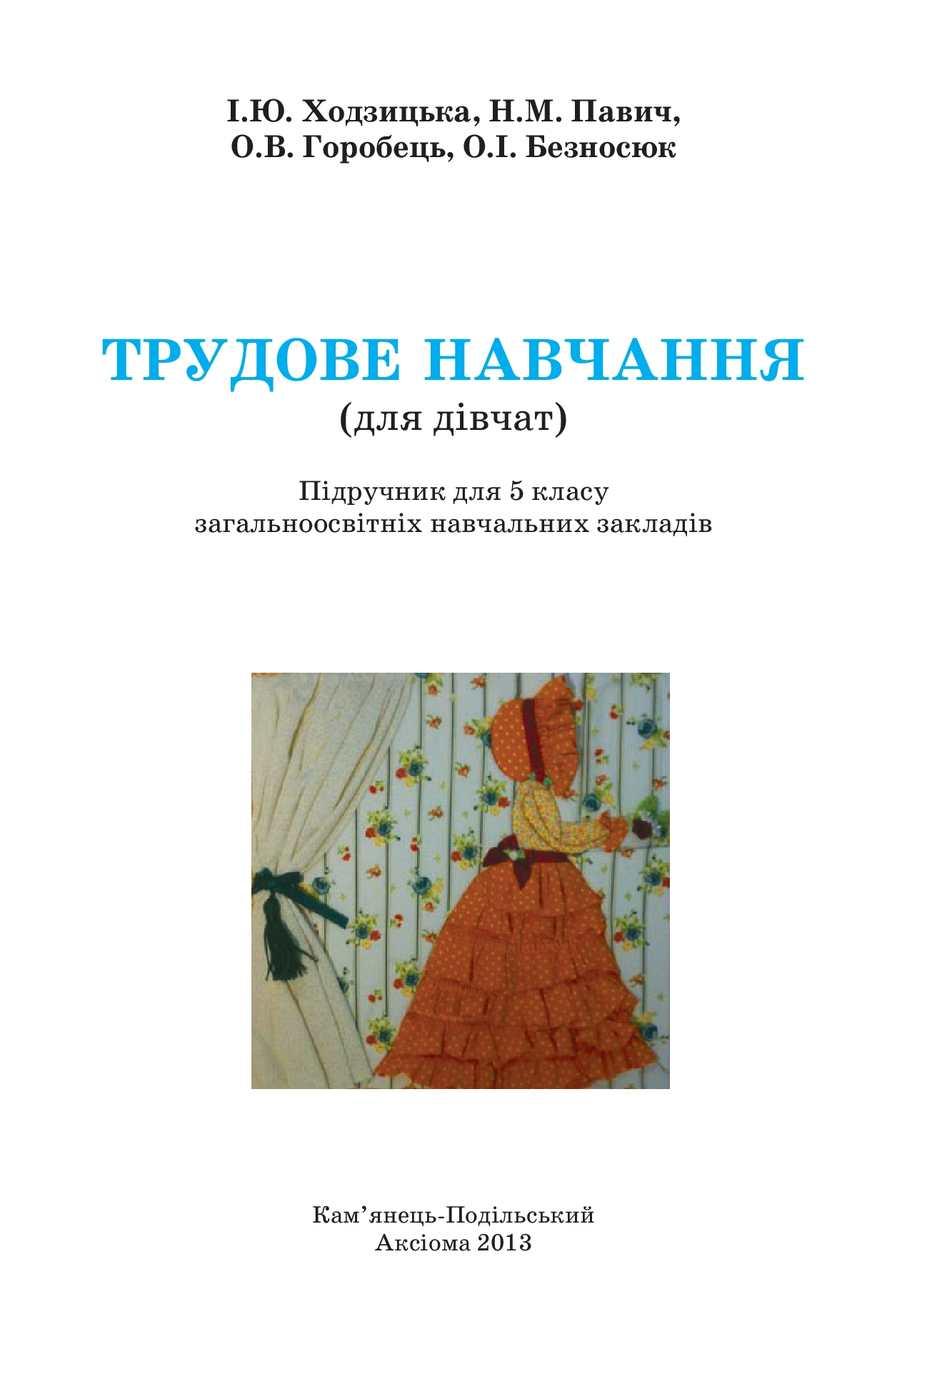 Calaméo - Трудове навчання (для дівчат) 5 клас Ходзицька da4a8b39de96e